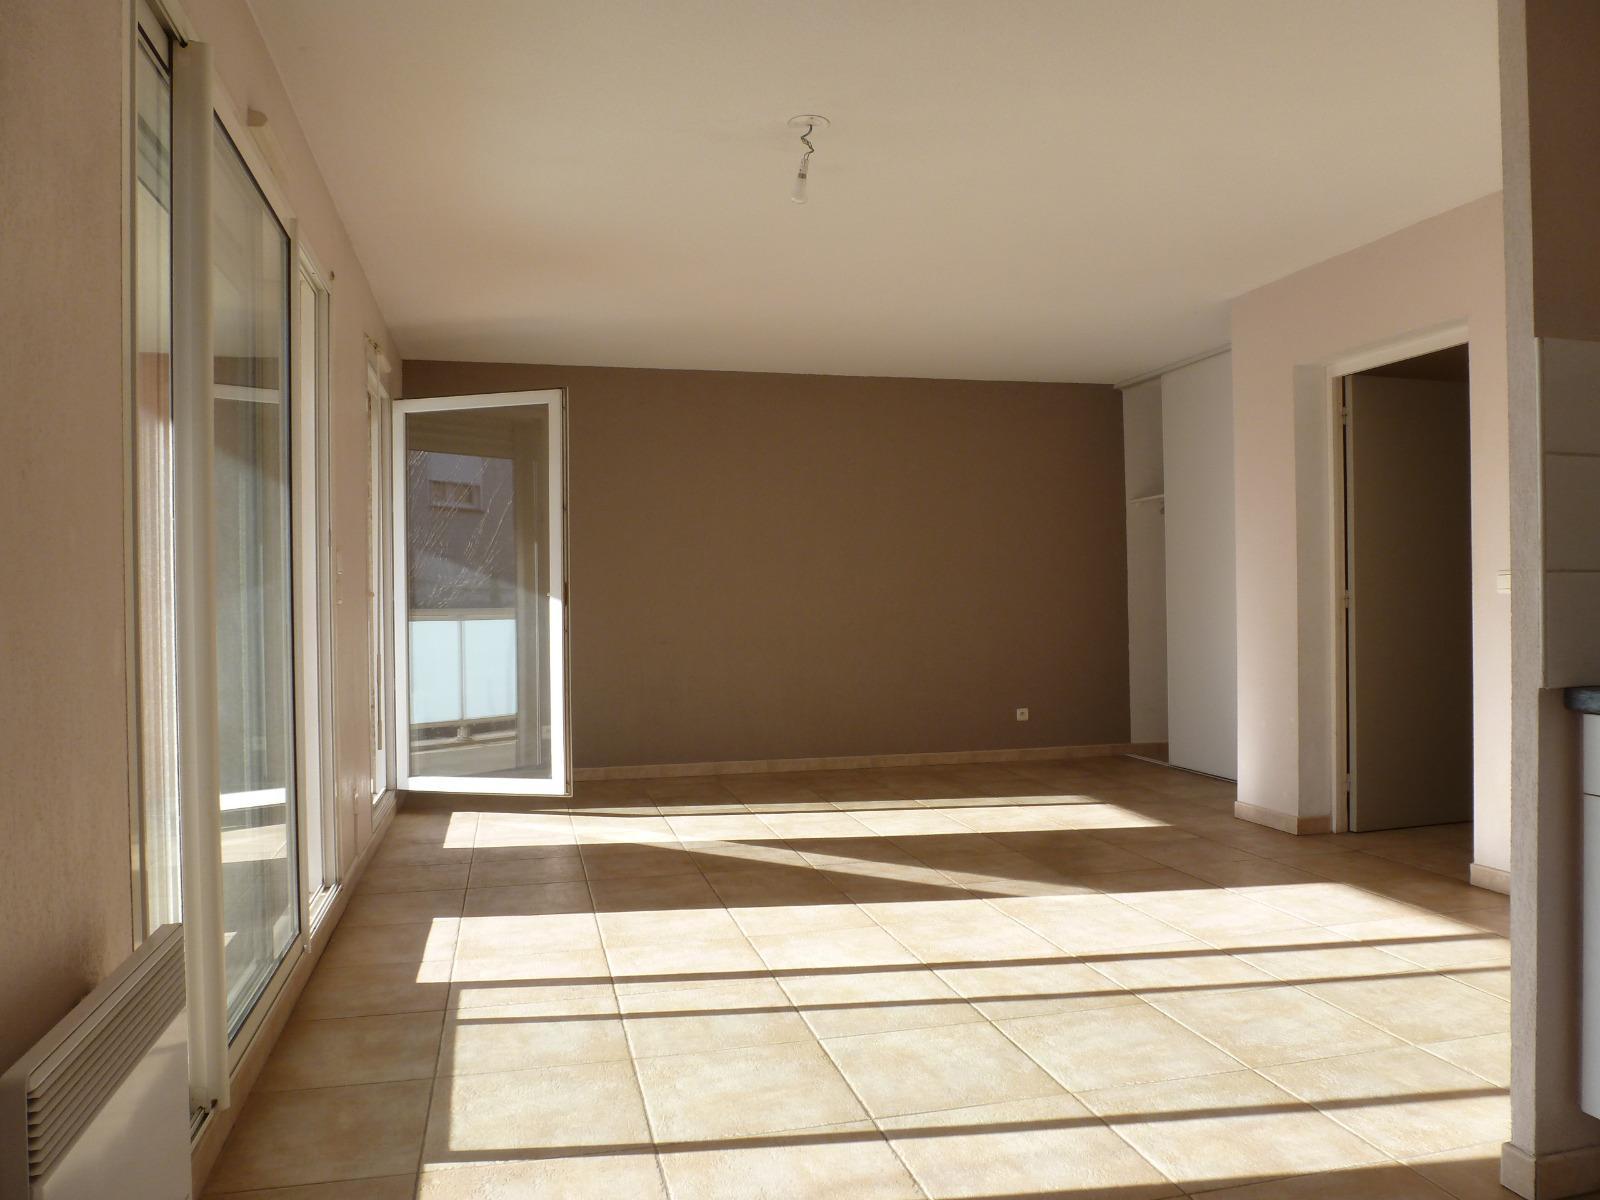 Location location a perpignan sud saint gaud rique appartement t3 677 cc terrasse garage - Location garage perpignan ...